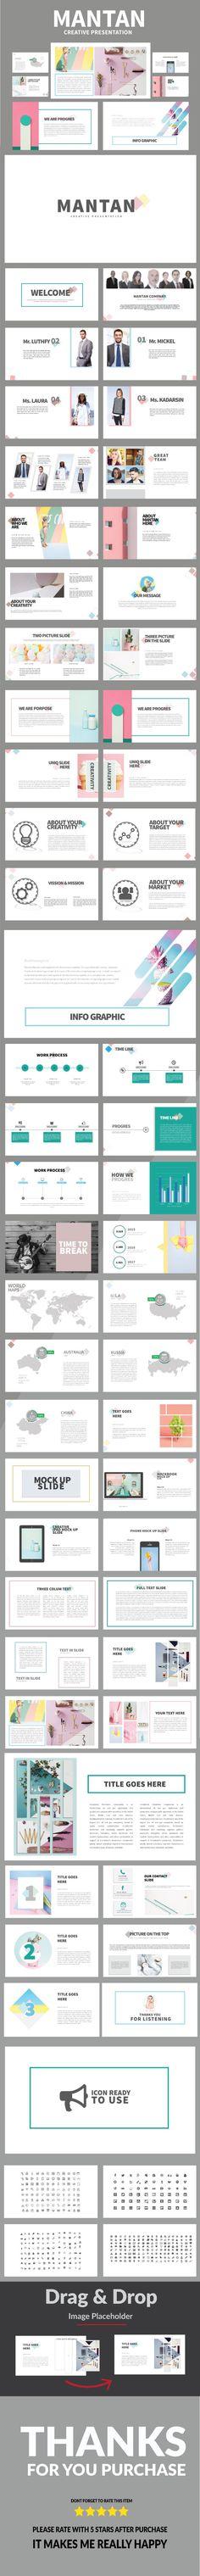 Mantan Multipurpose Powerpoint (PowerPoint Templates)